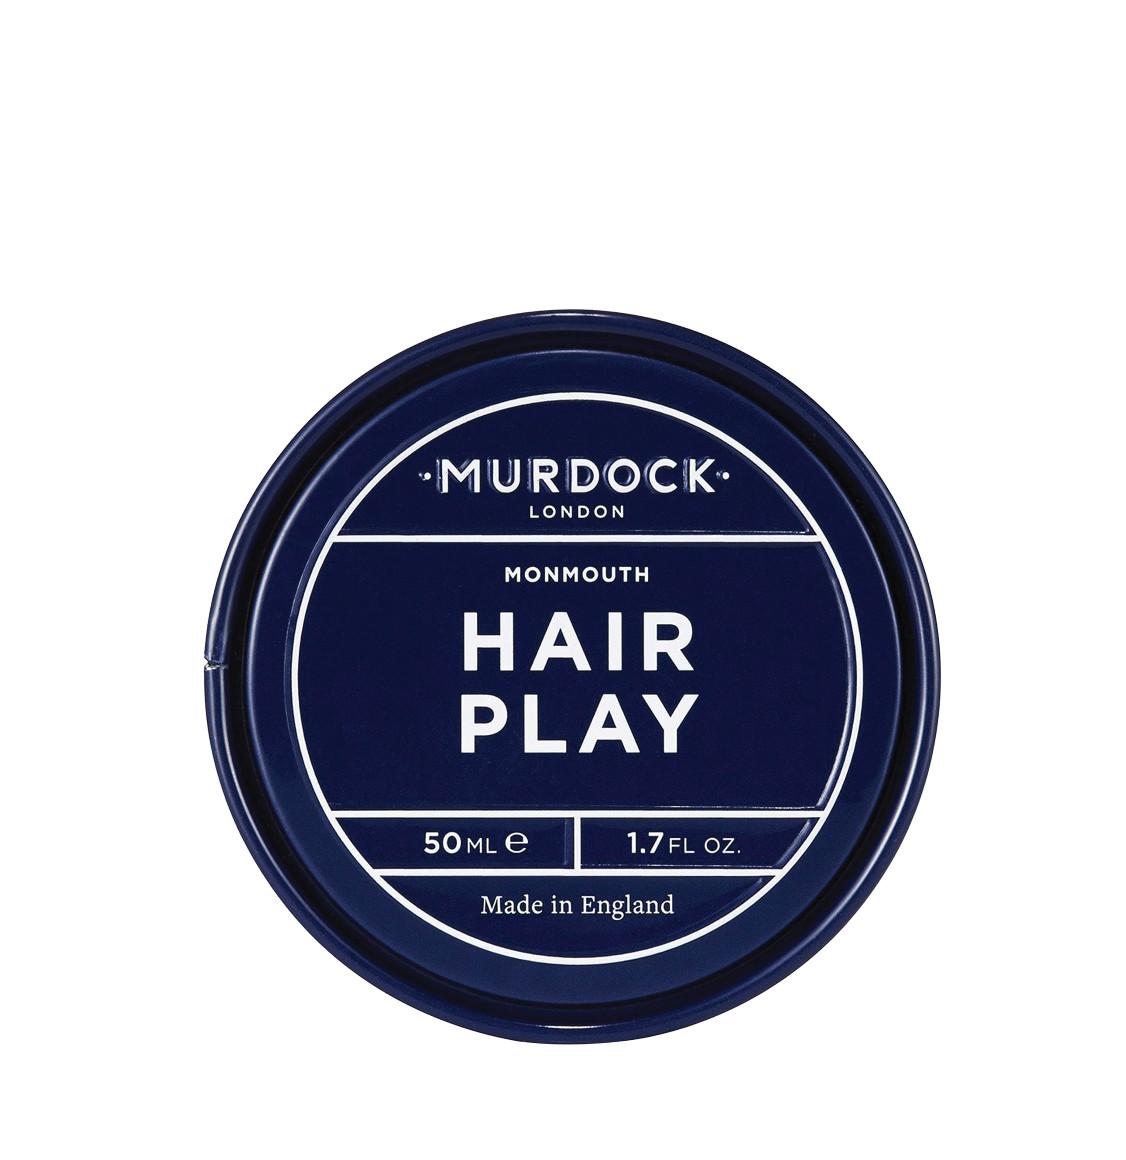 Murdock London Hair Clay Hair Play 50ml